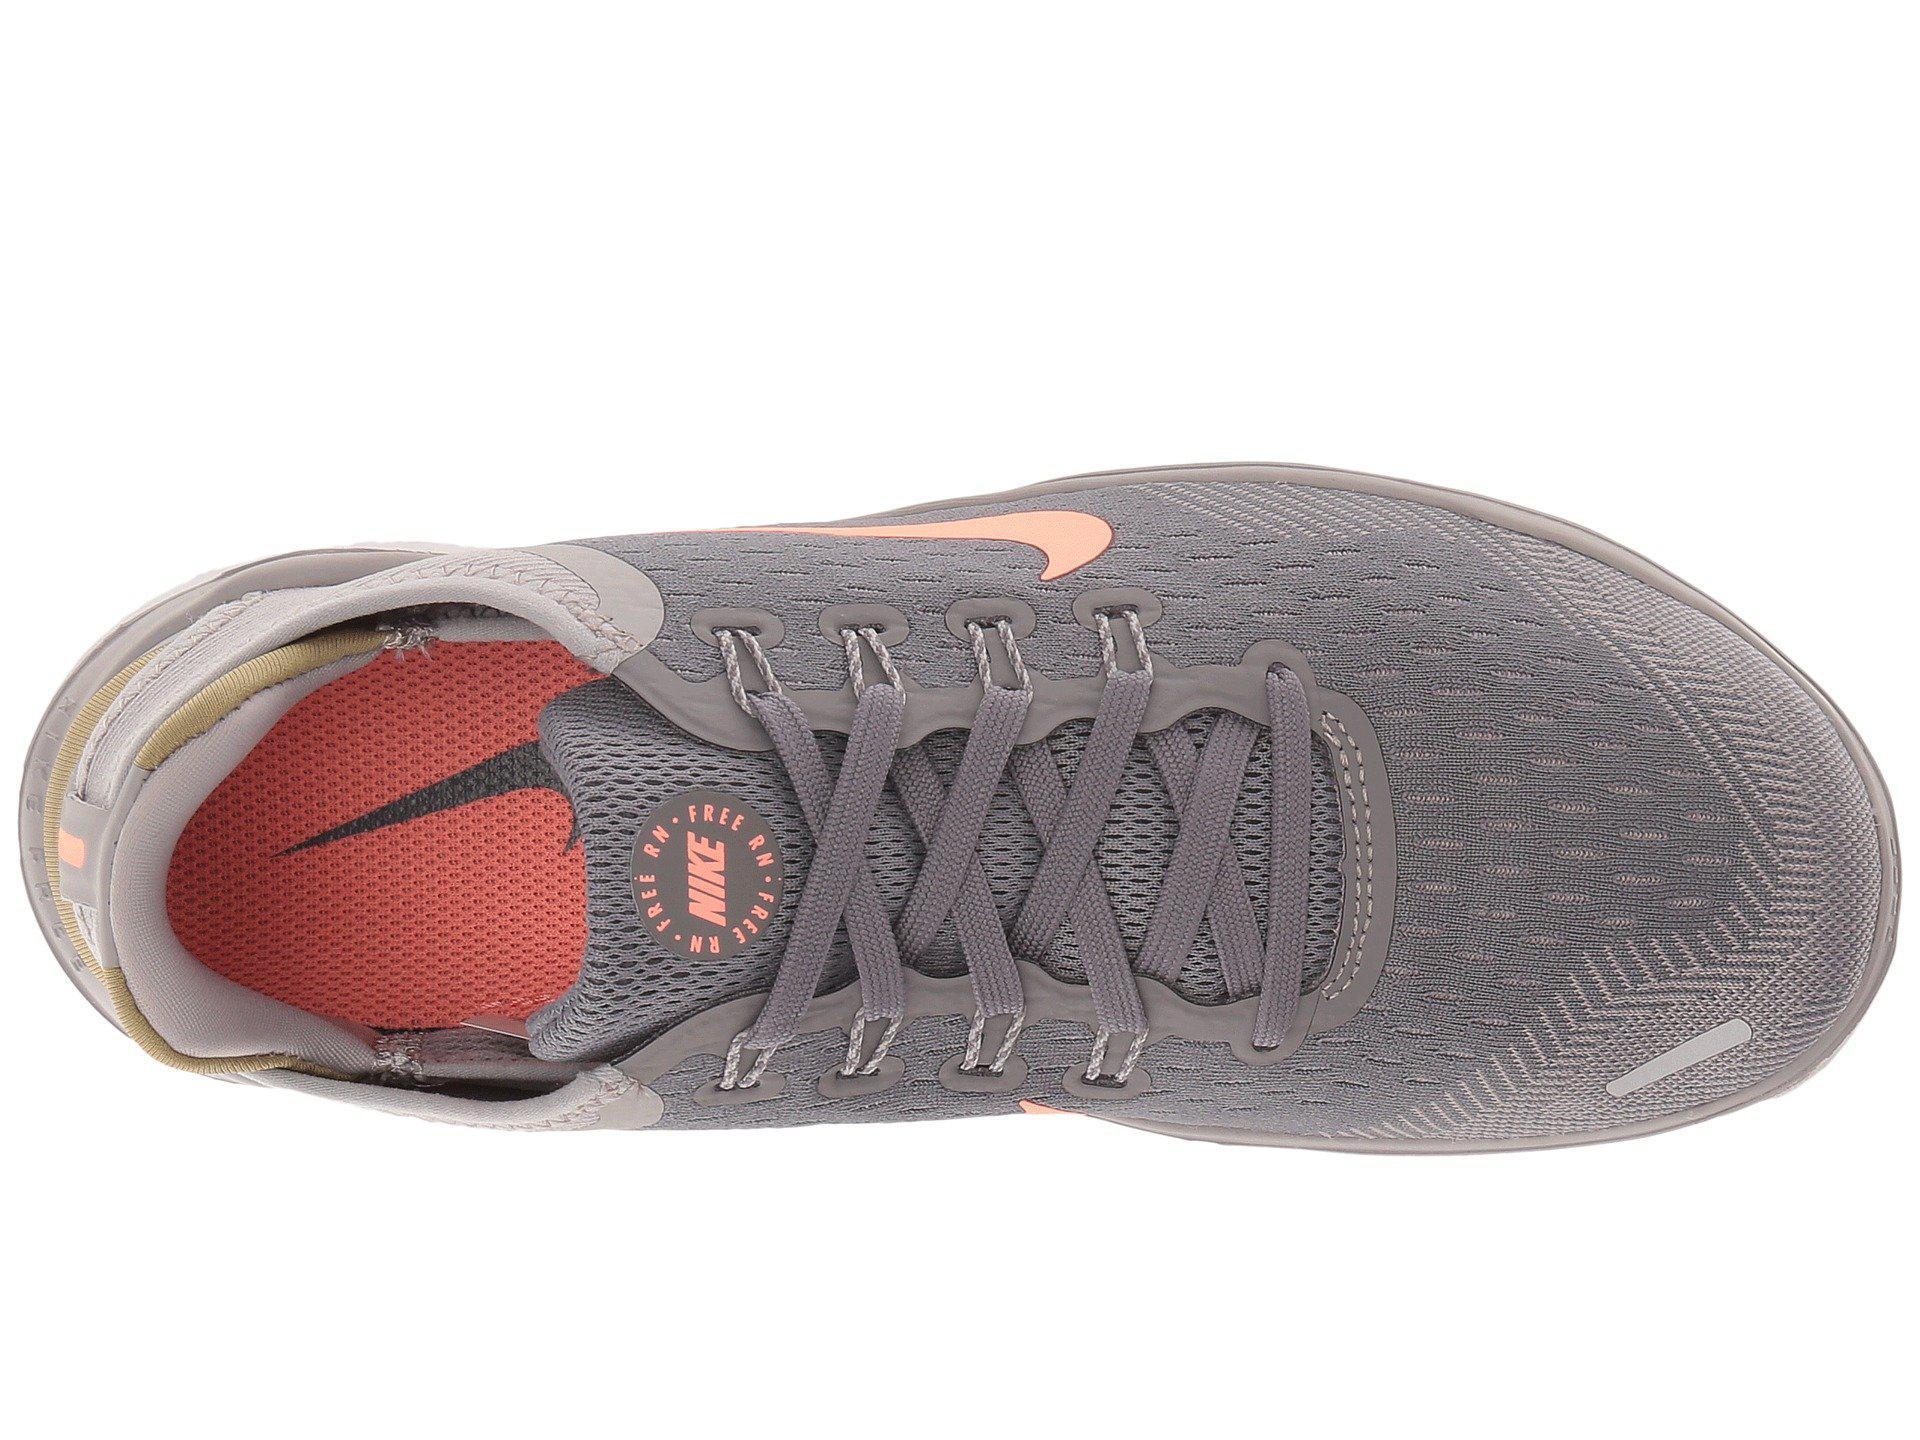 55525518b74 Lyst - Nike Free Rn 2018 (flash Crimson black orange Peel white ...